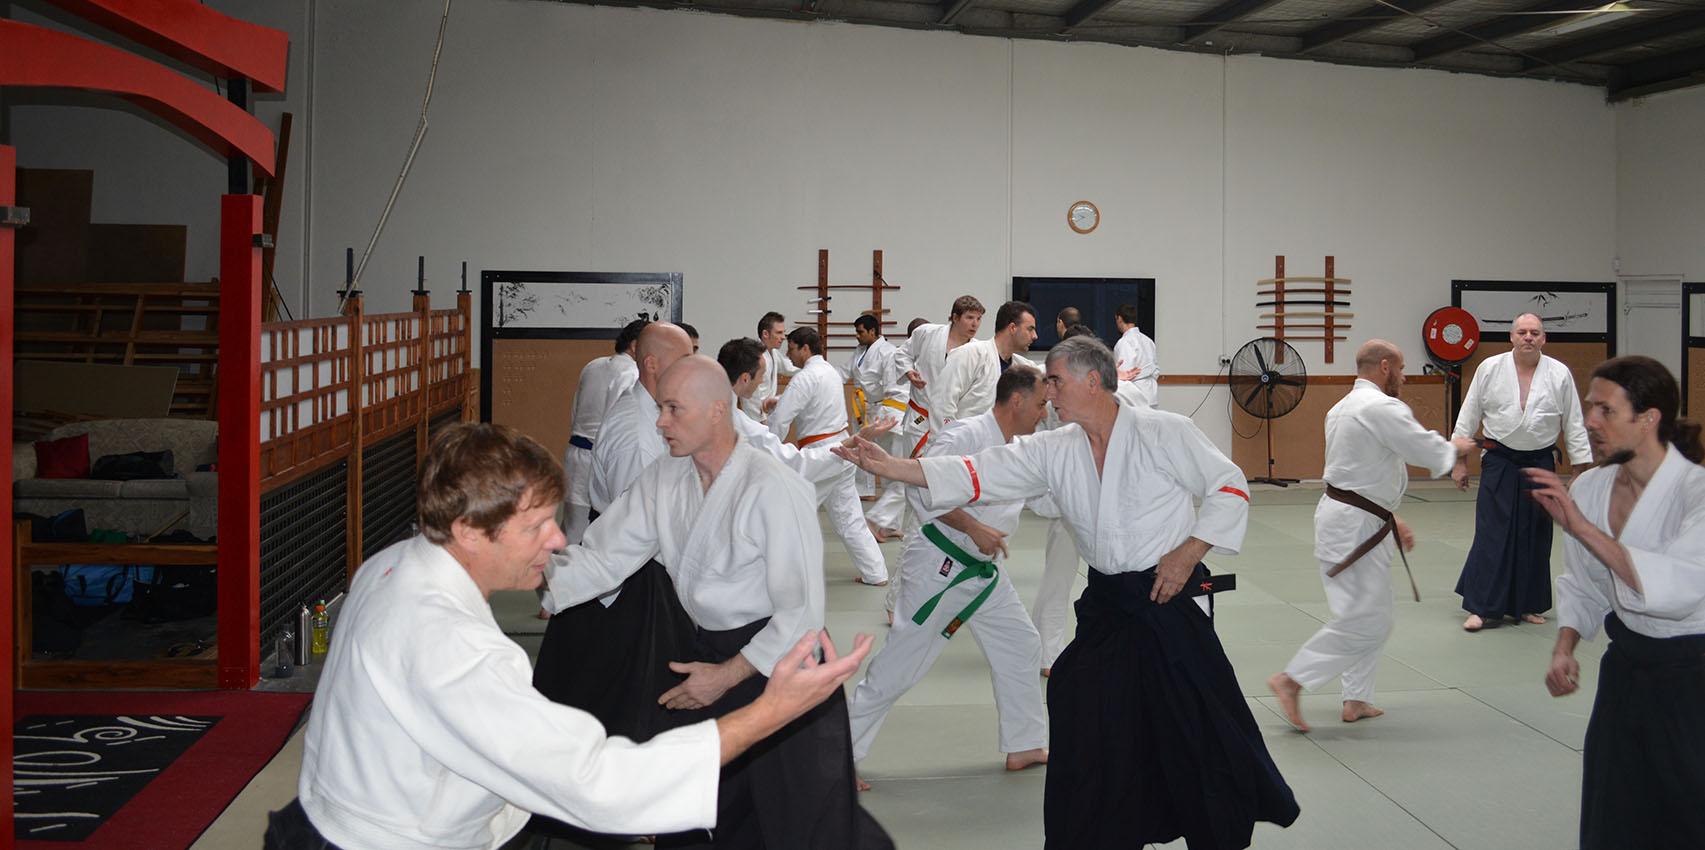 Exercises – Tai-no-henko